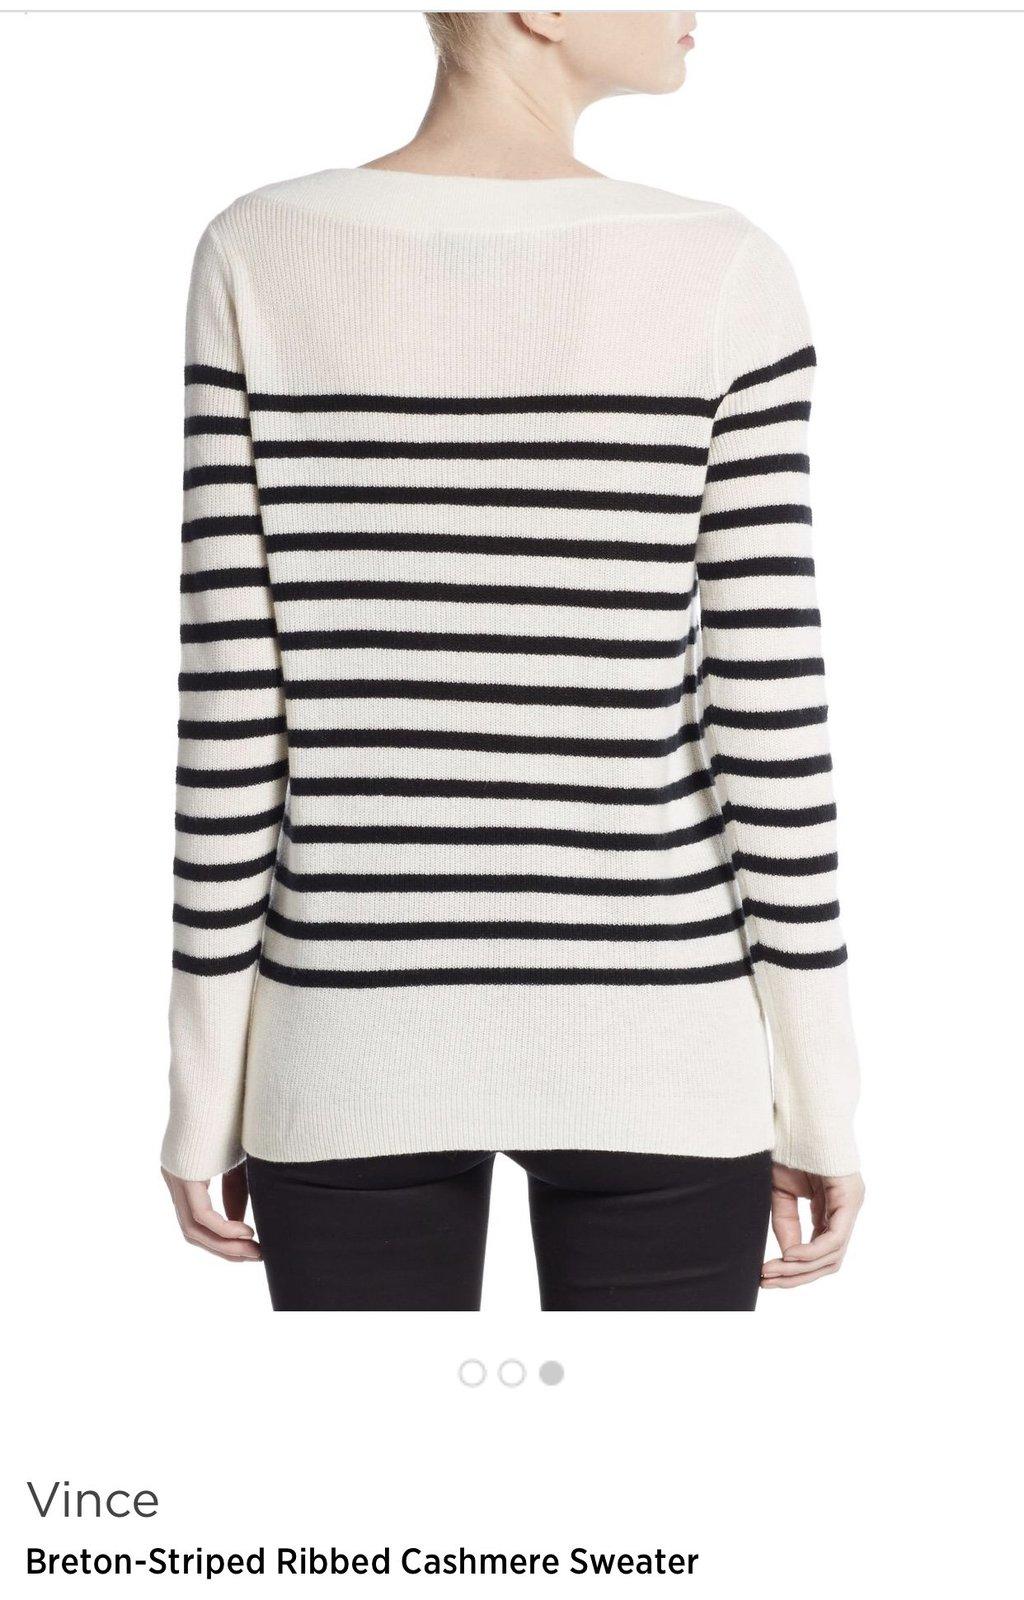 Vince 100% cashmere stripe sweater, size XL , white /black